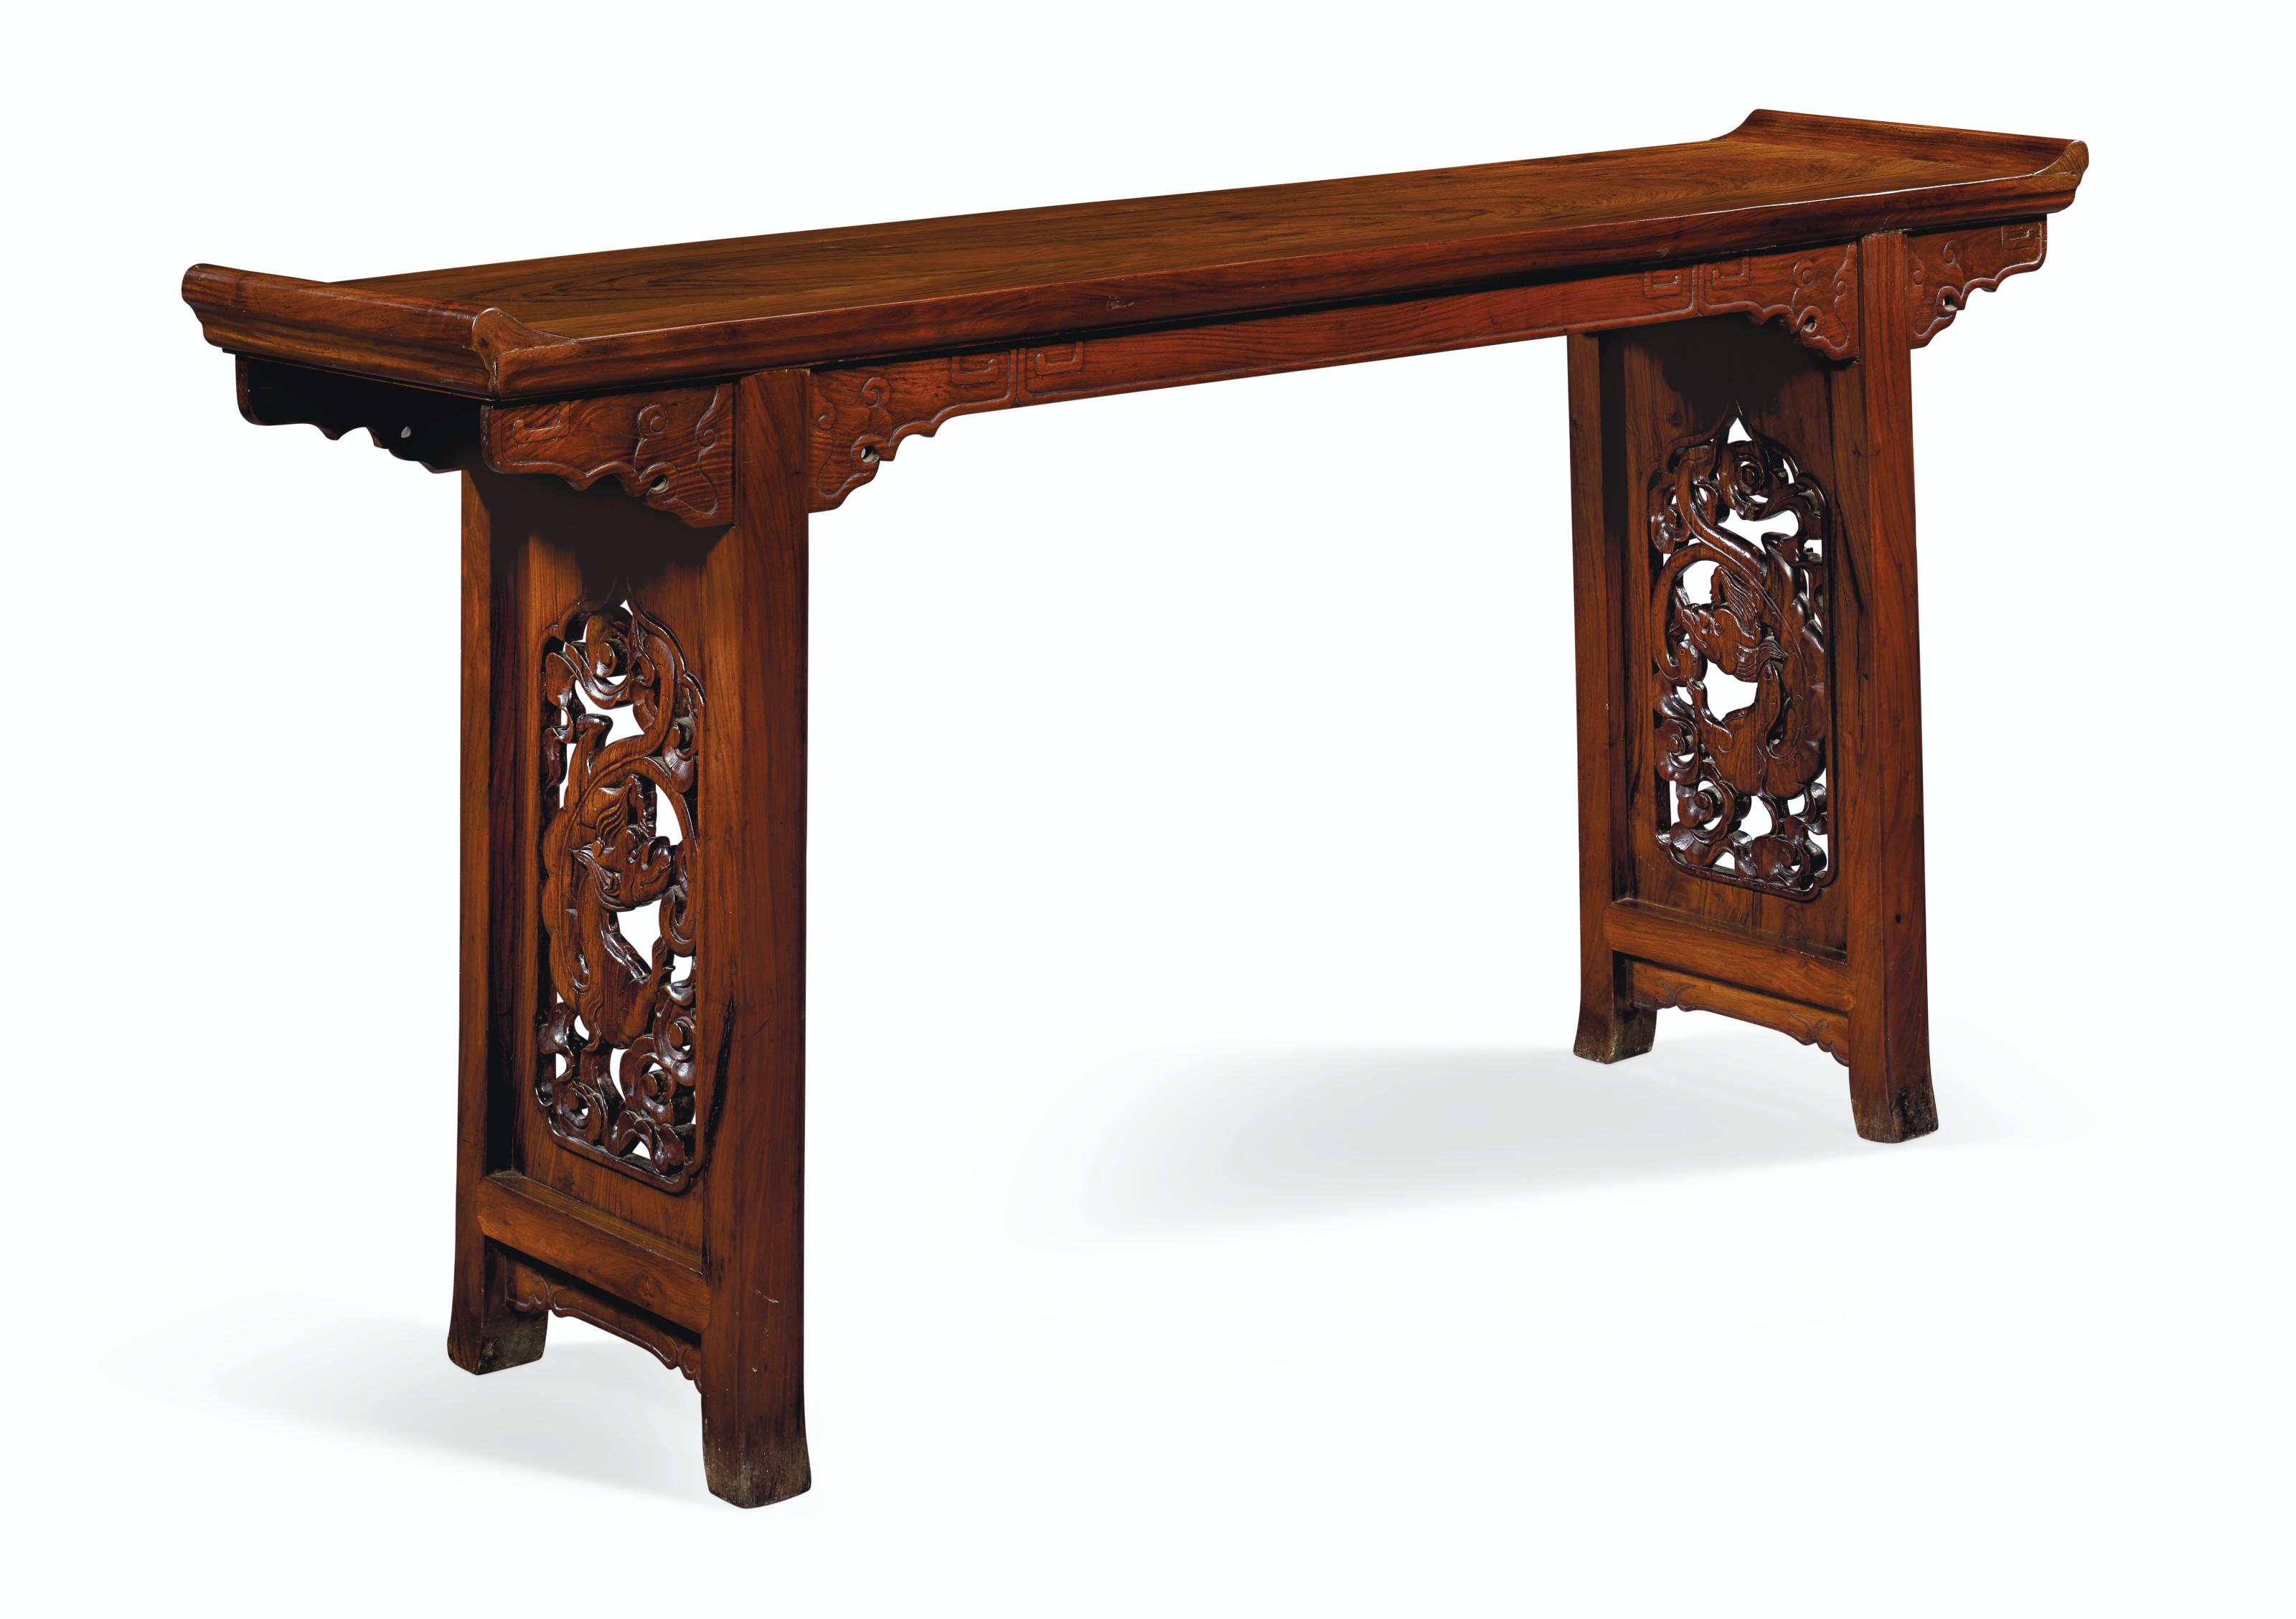 A RARE HUANGHUALI TRESTLE-LEG TABLE